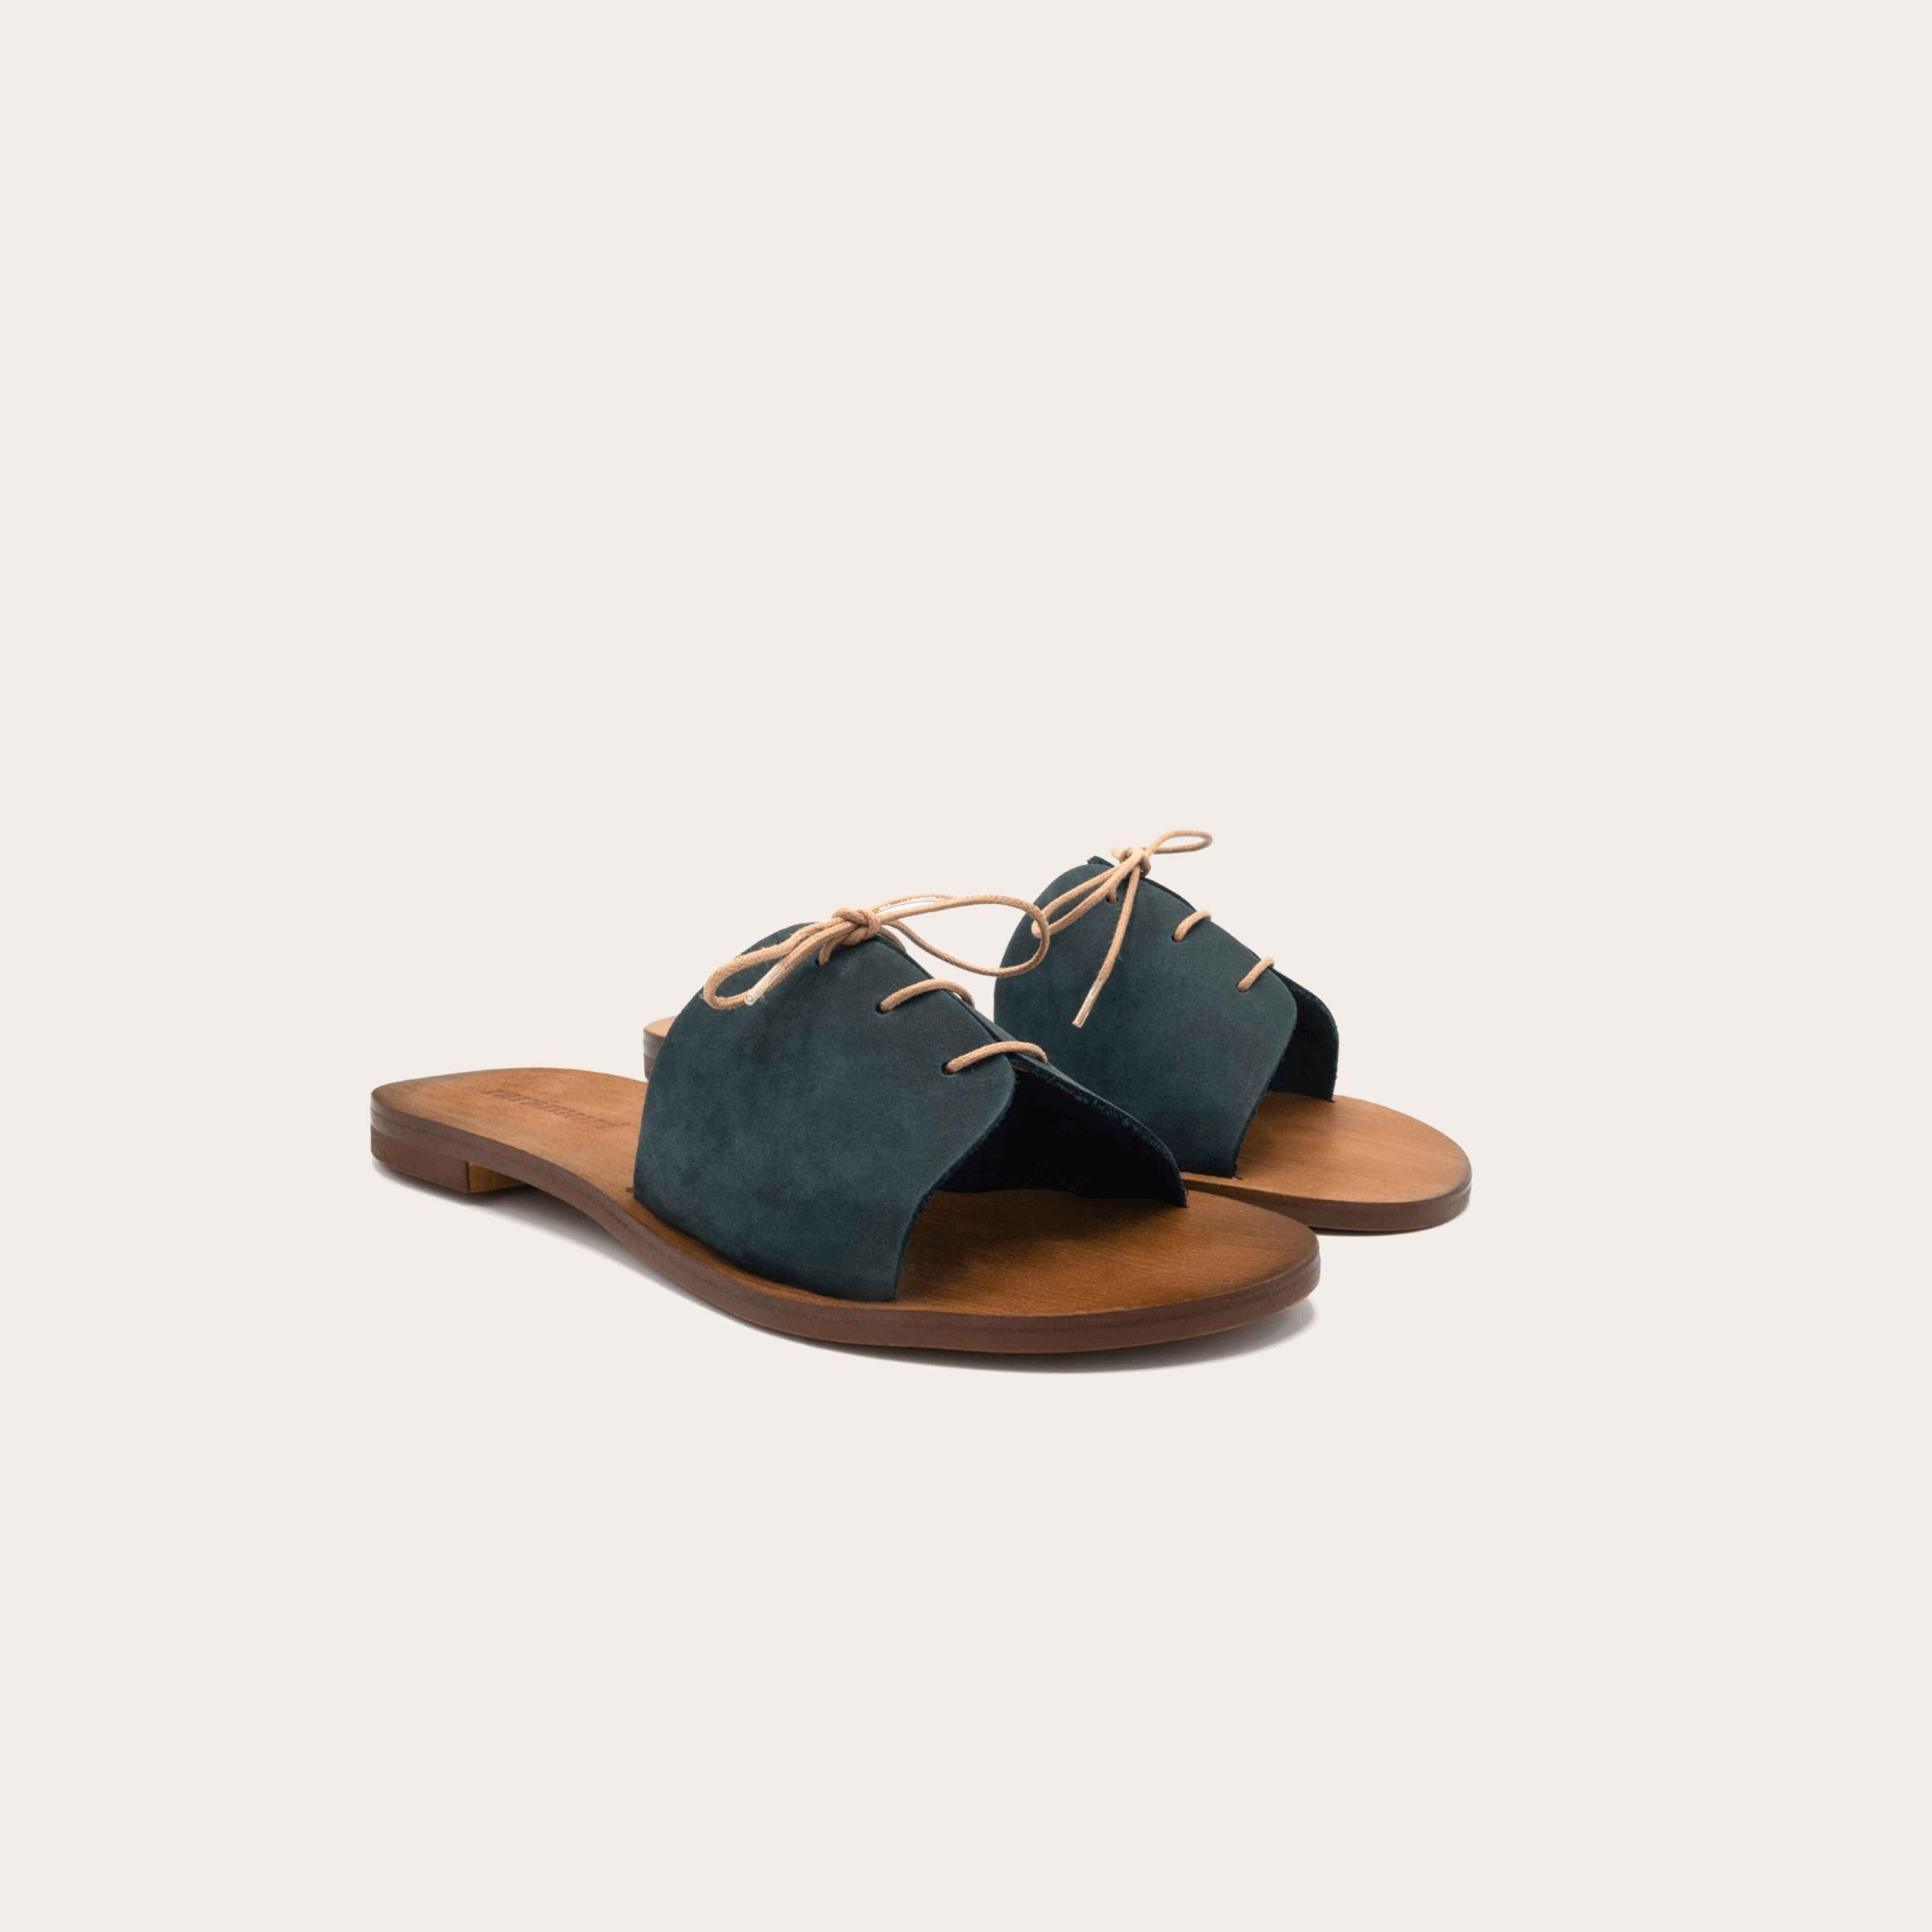 cali-blue_3_lintsandalen sandals travelsandals vegan sustainable sandals wikkelsandalen